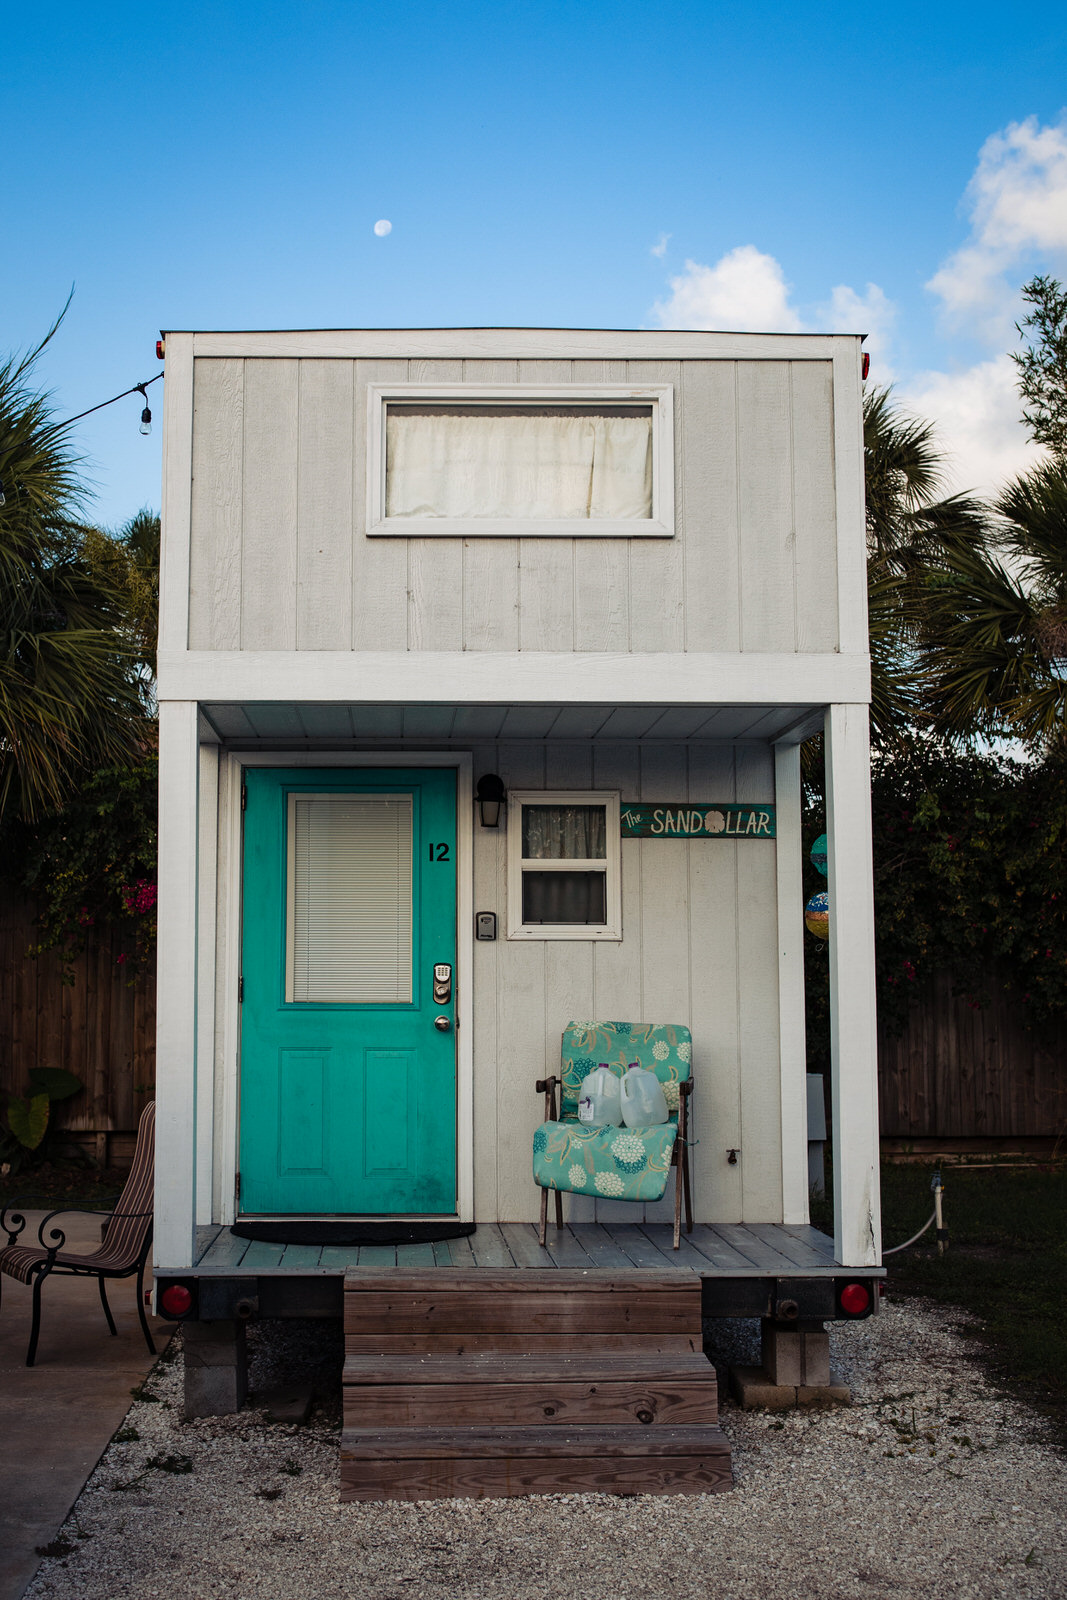 siesta-key-florida-tiny-house-photo-vacation-beach-nature-macro-3.jpg